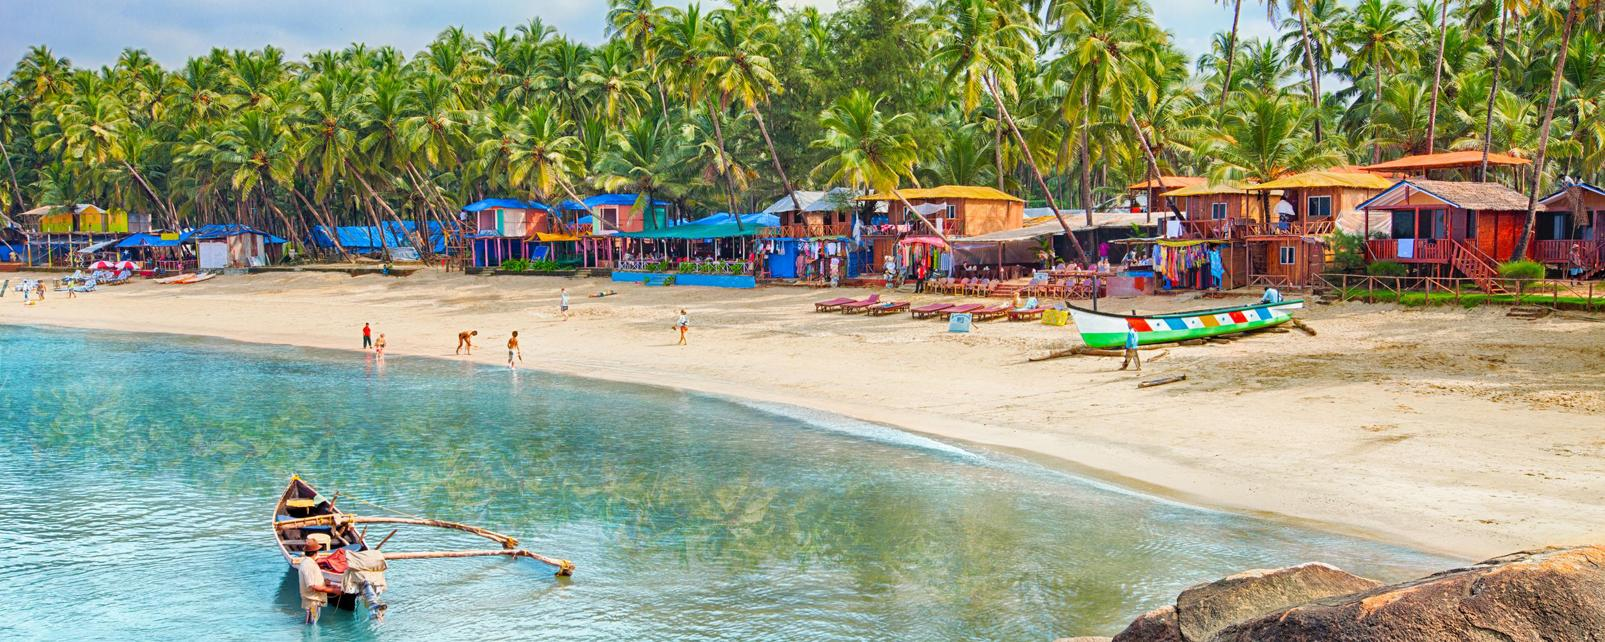 GOA Playas 2